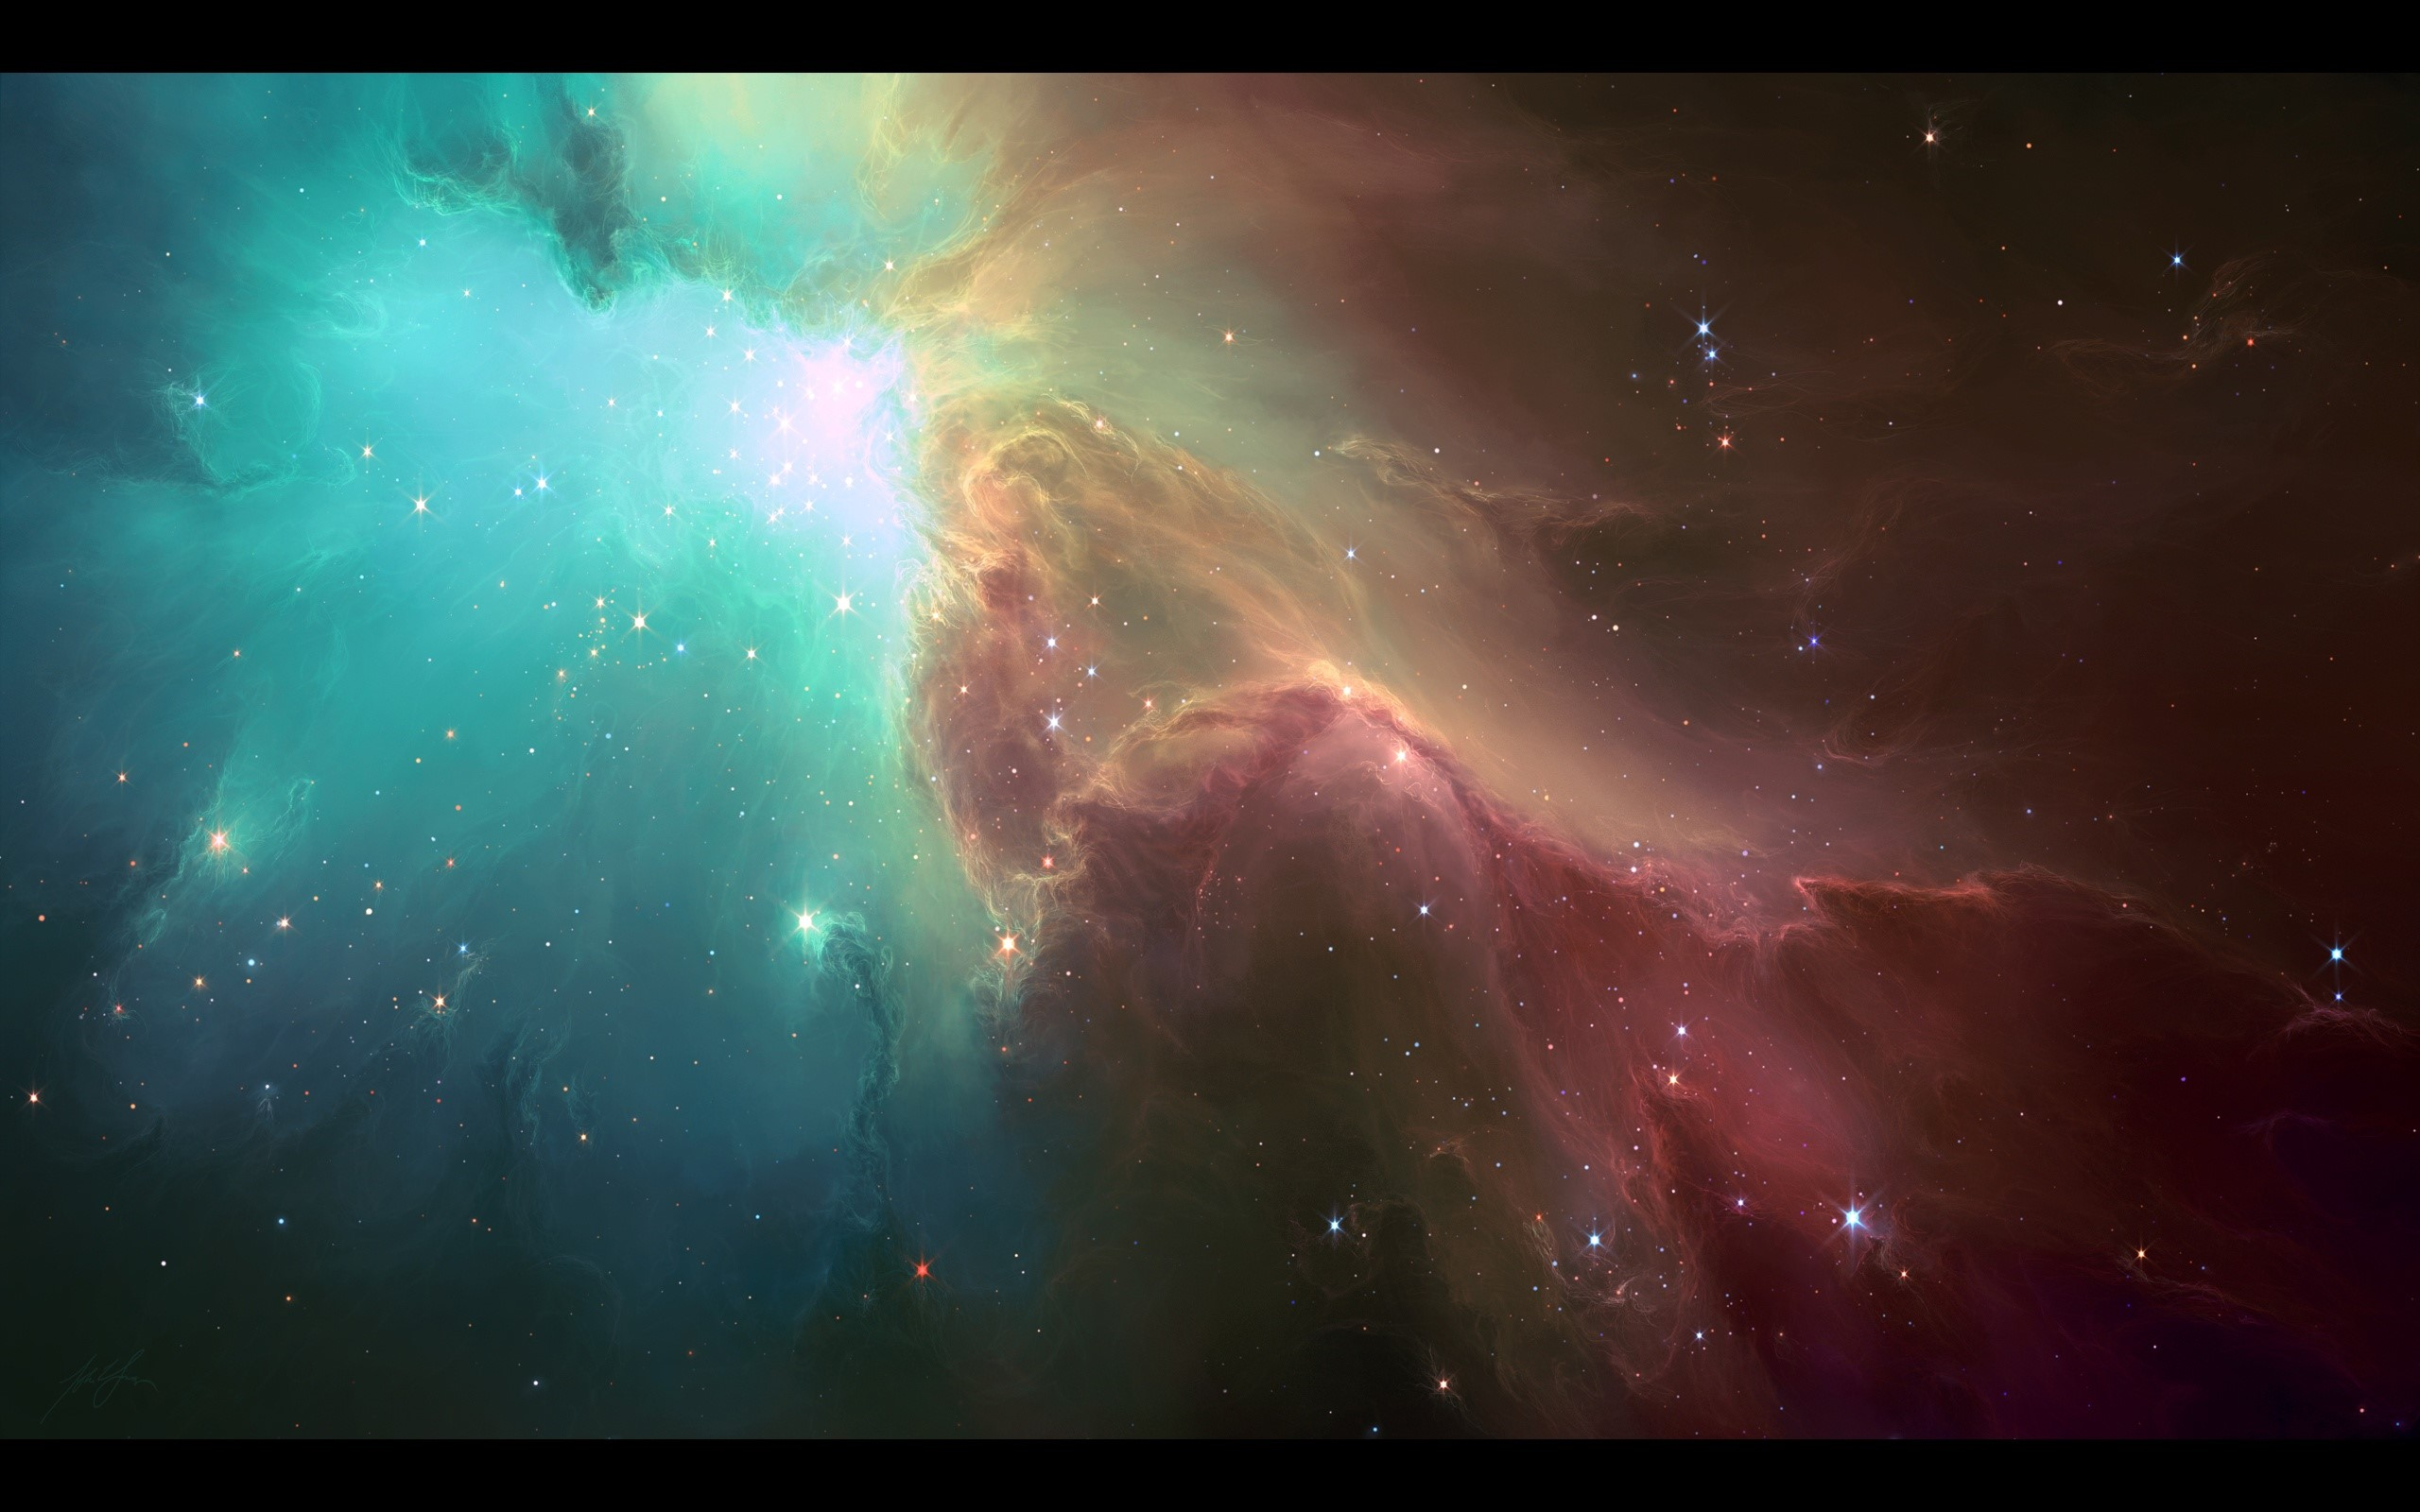 Fondo de pantalla de Nebula Imágenes